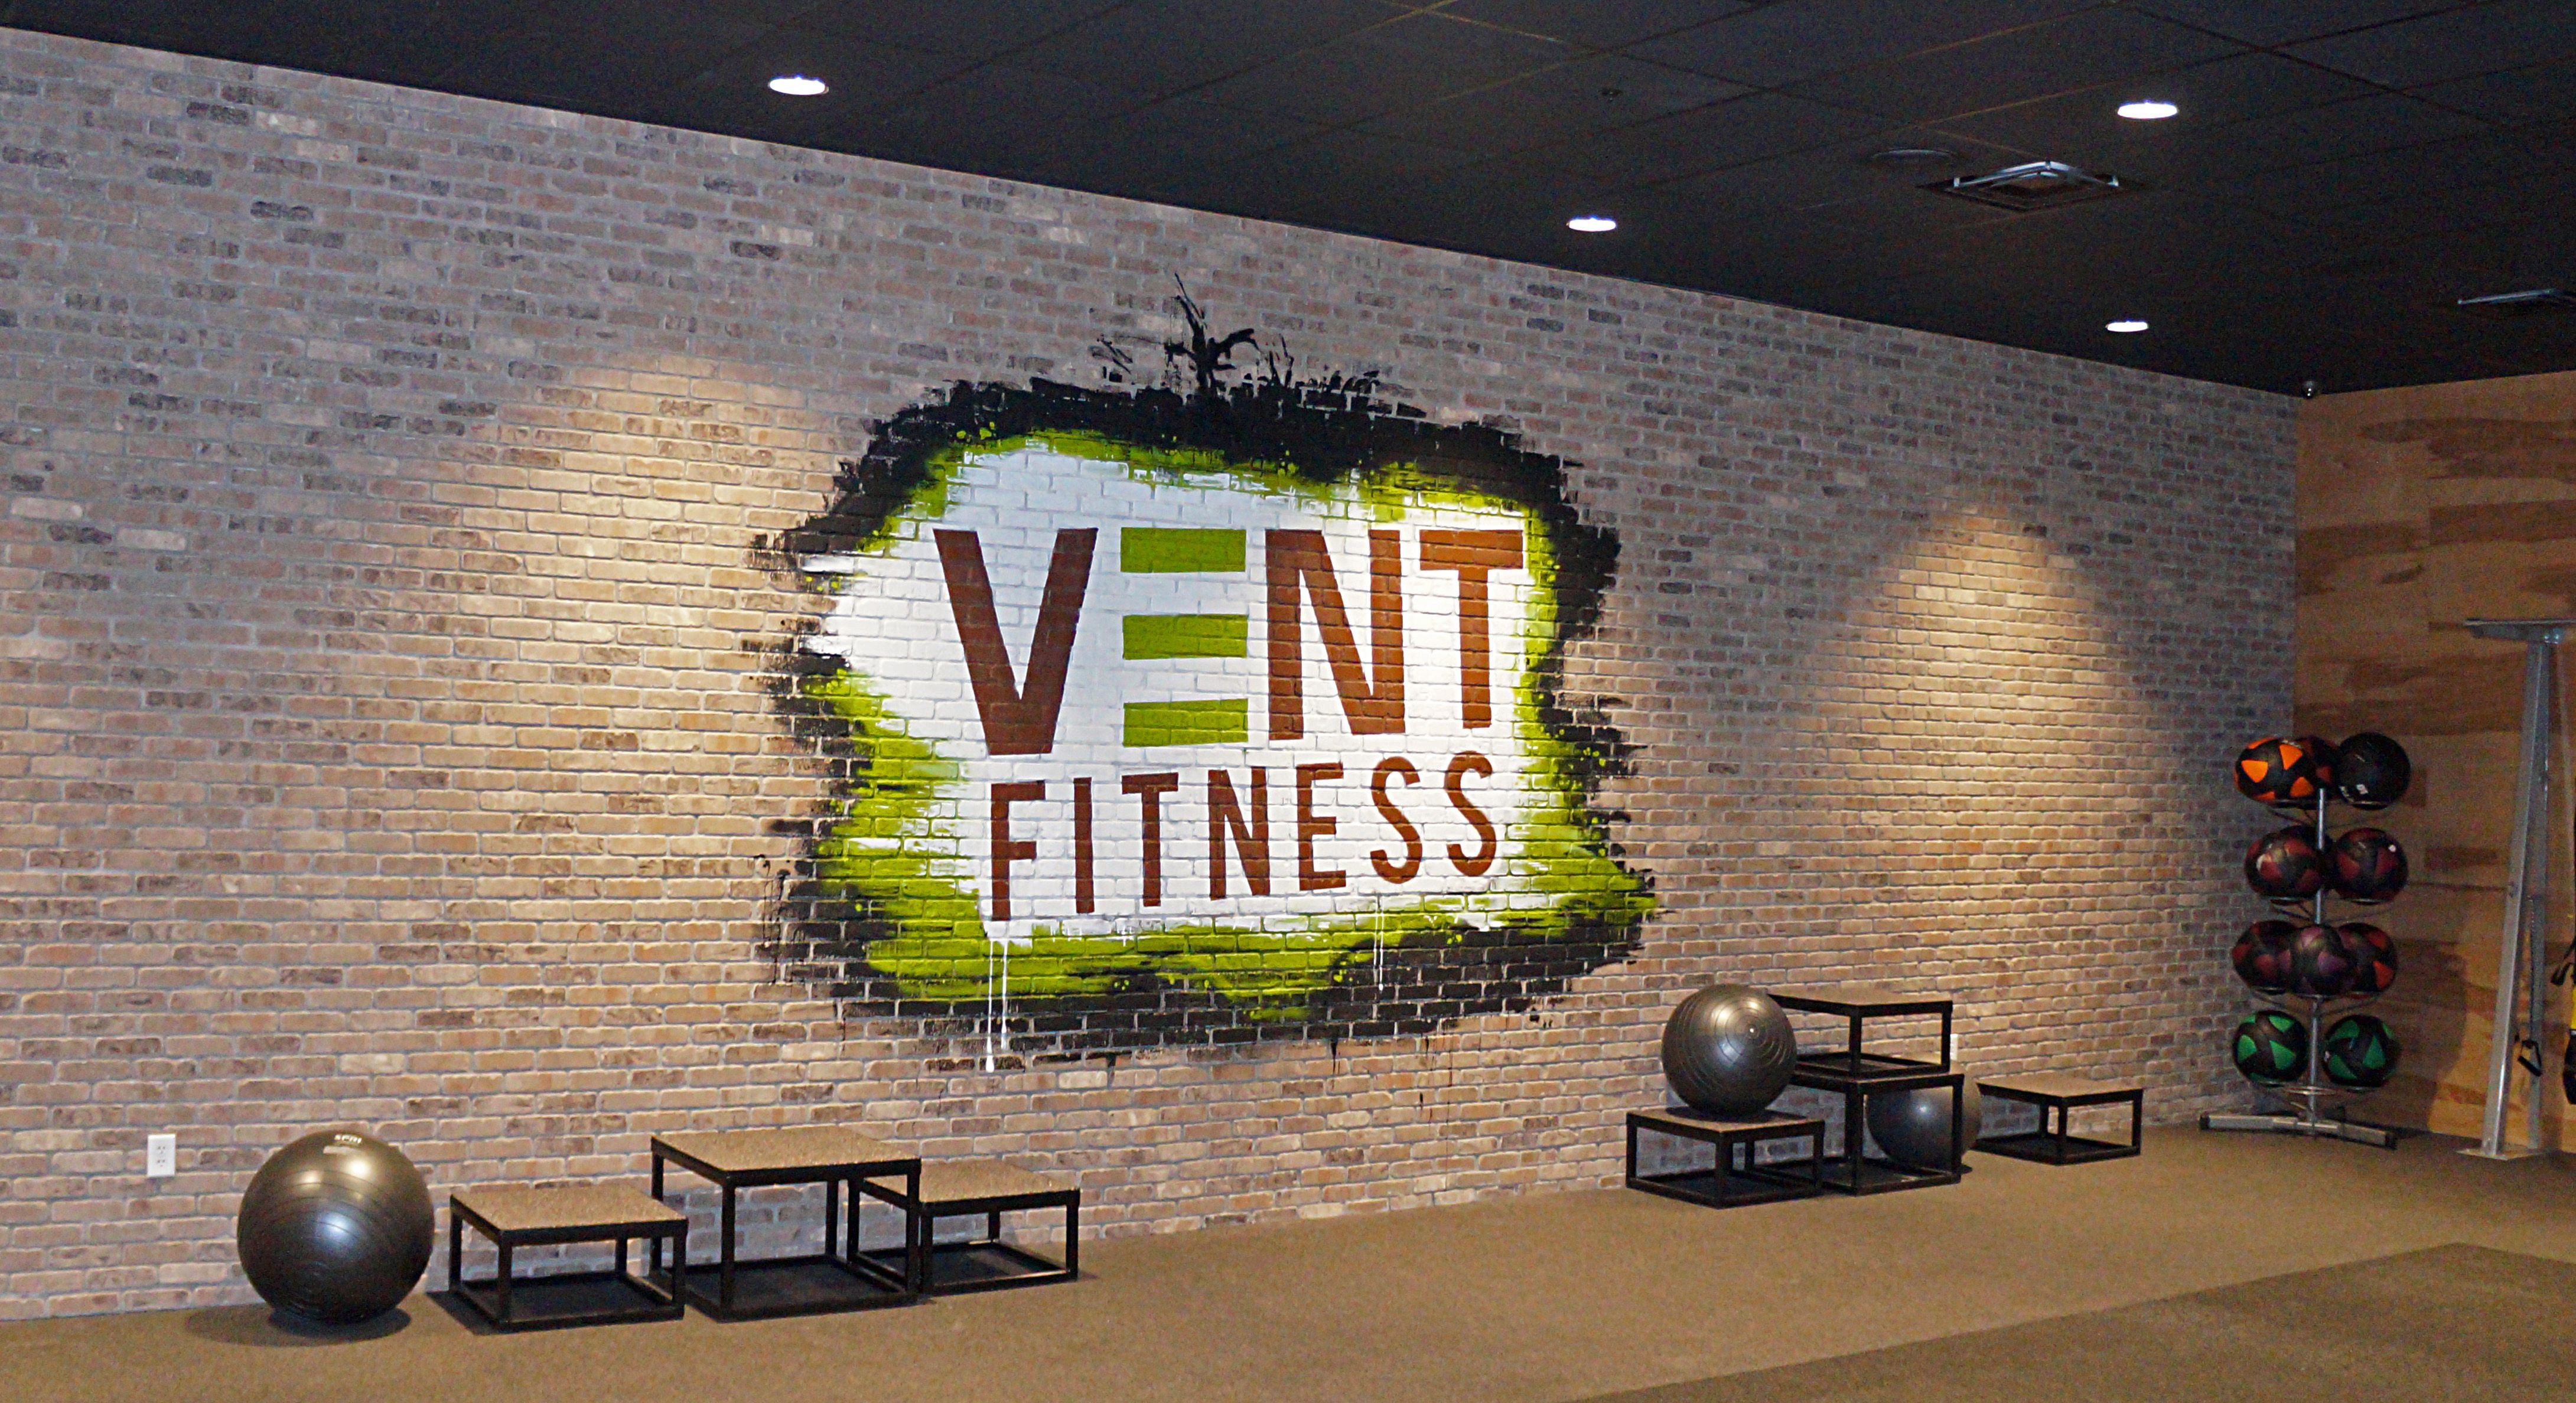 Fitness Graffiti Google Suche Cool Wallpaper Wallpaper Graffiti Font Style